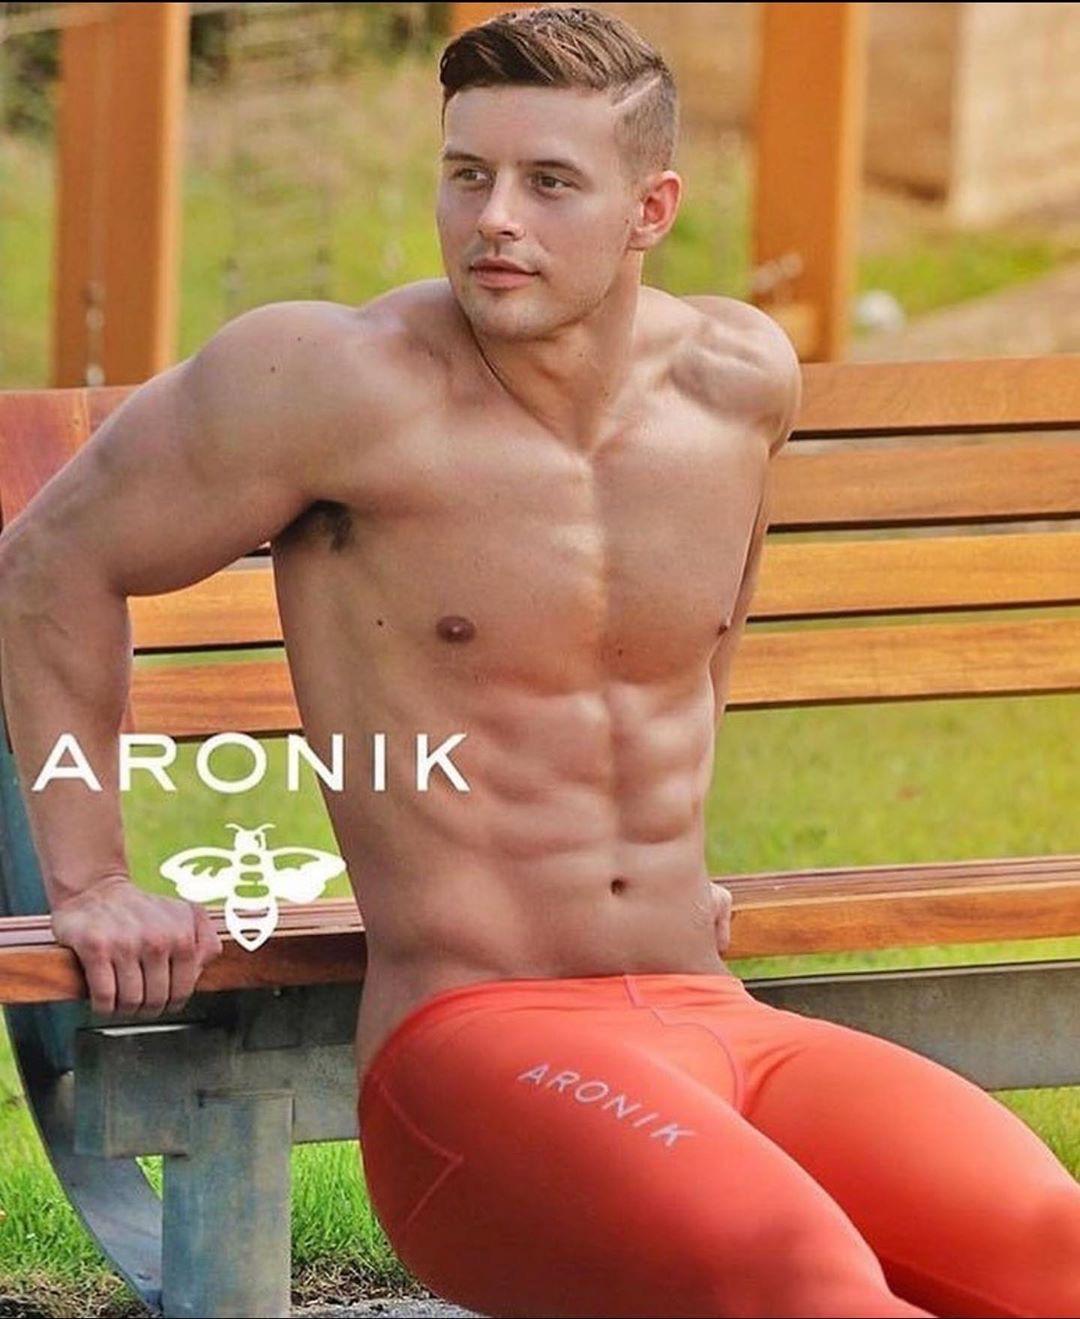 Bief Distraction featuring Aronik